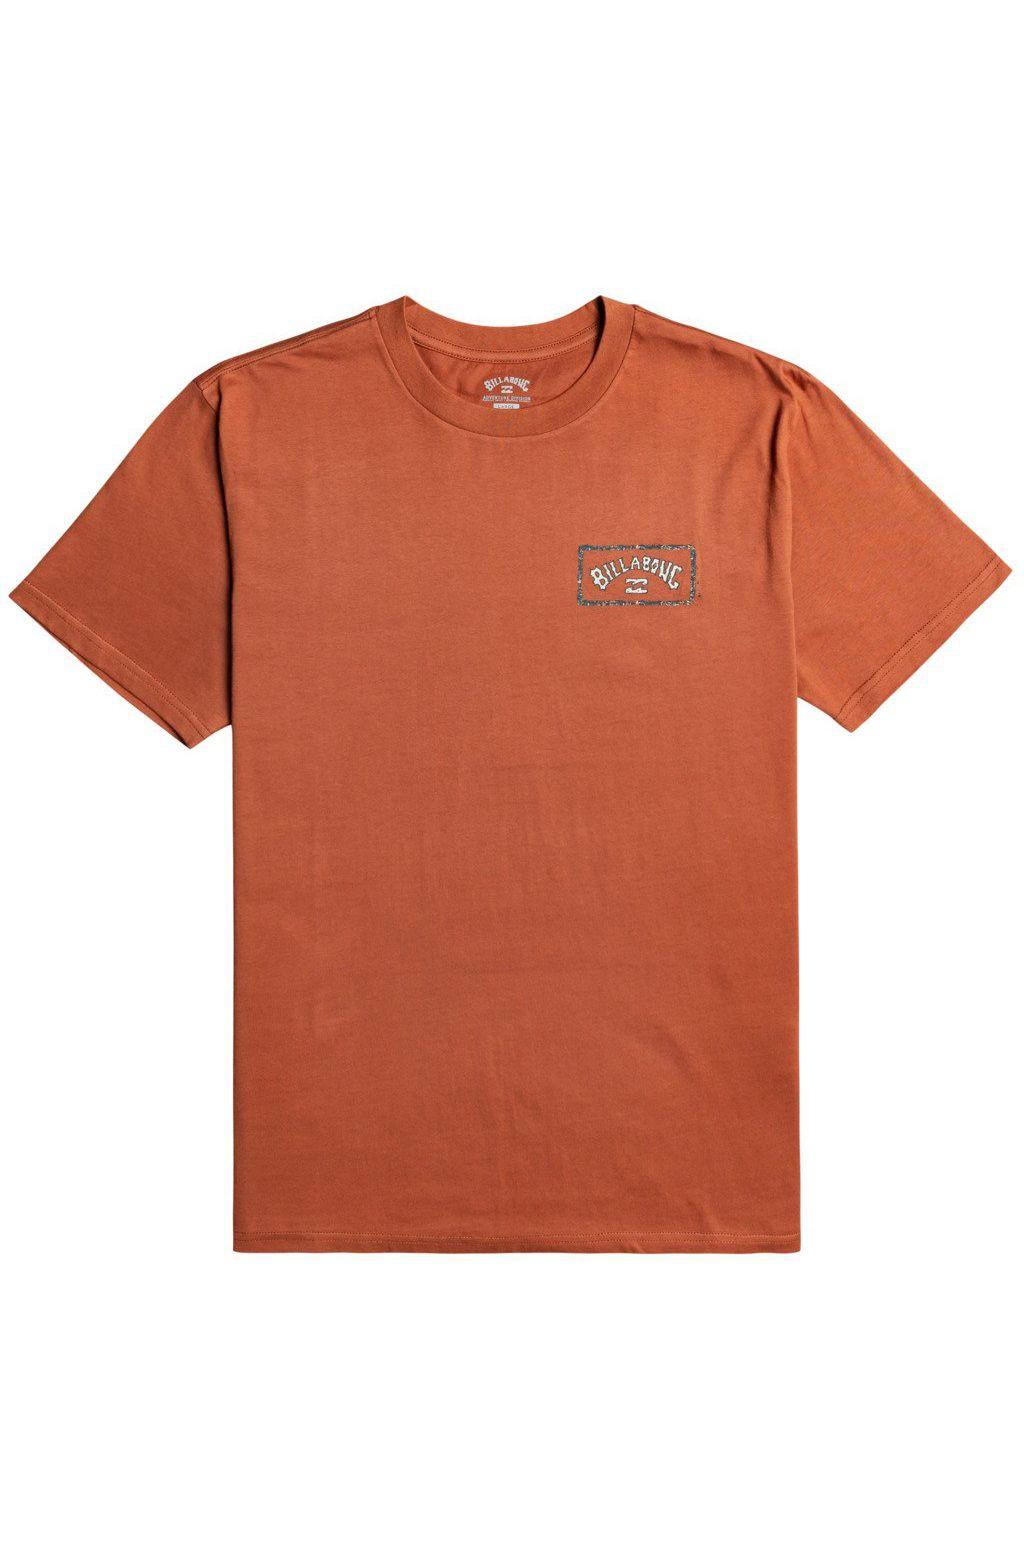 T-Shirt Billabong ARCH ADIV SS ADVENTURE DIVISION Amber